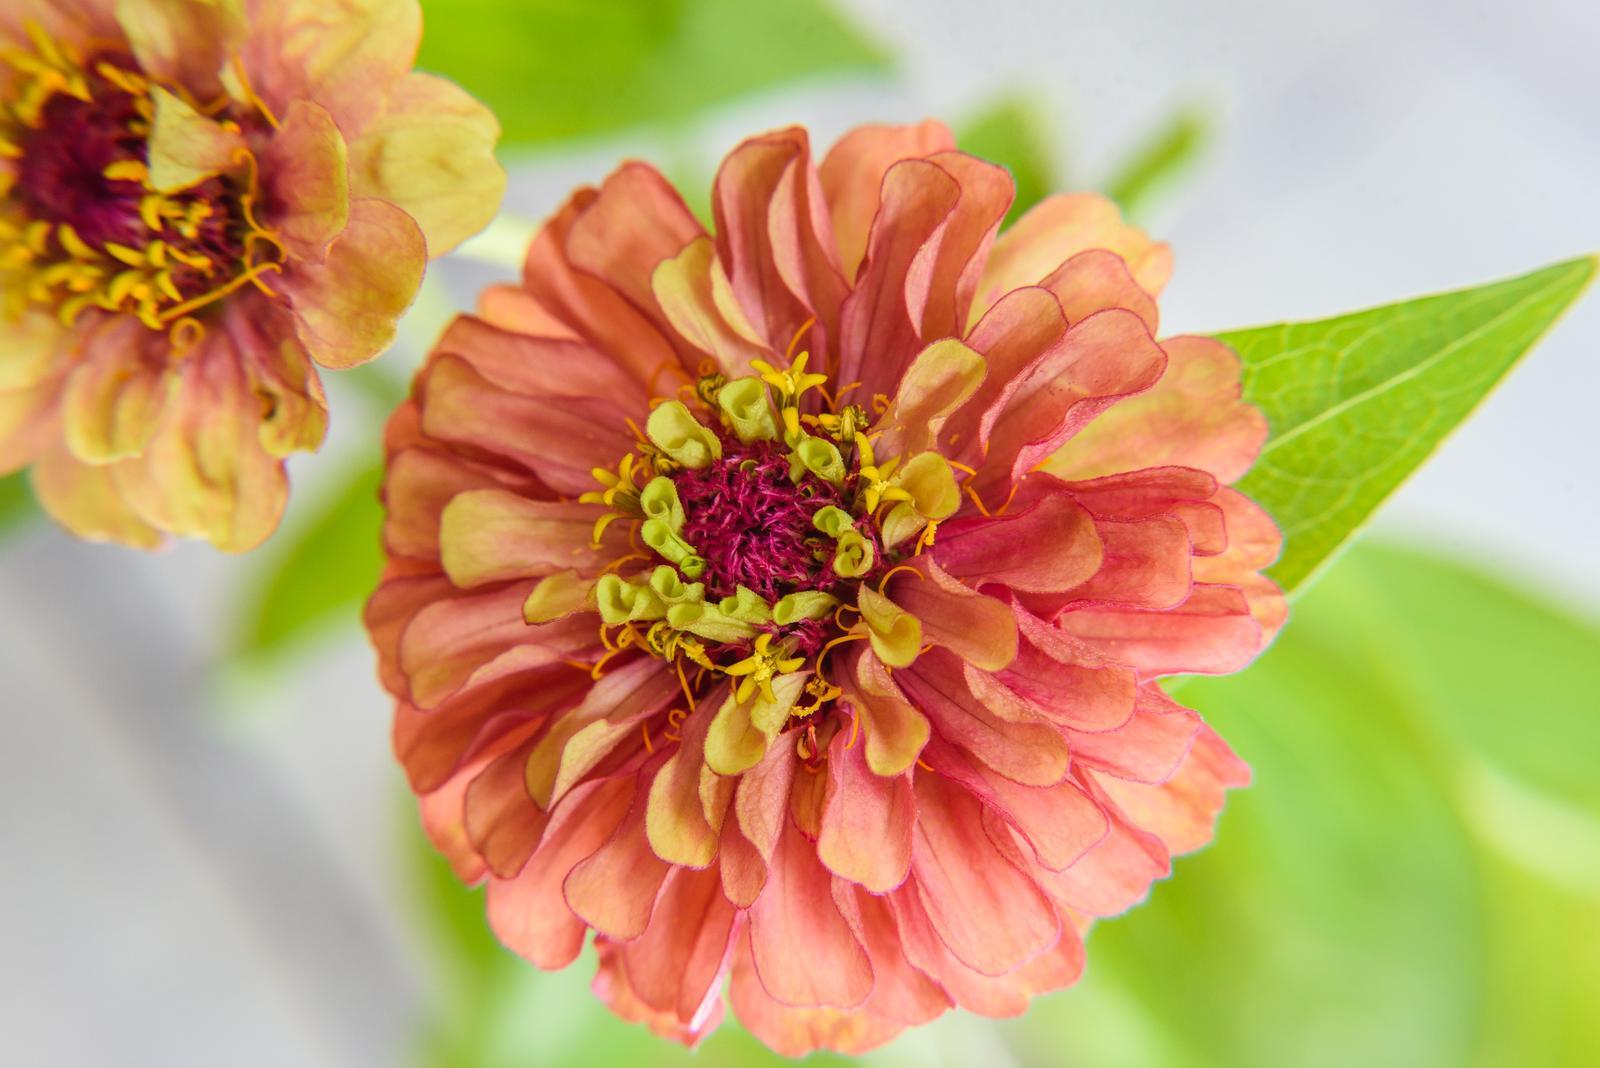 Vo víre kvetov... - Zakvitla mi na parapete v kelímku :)